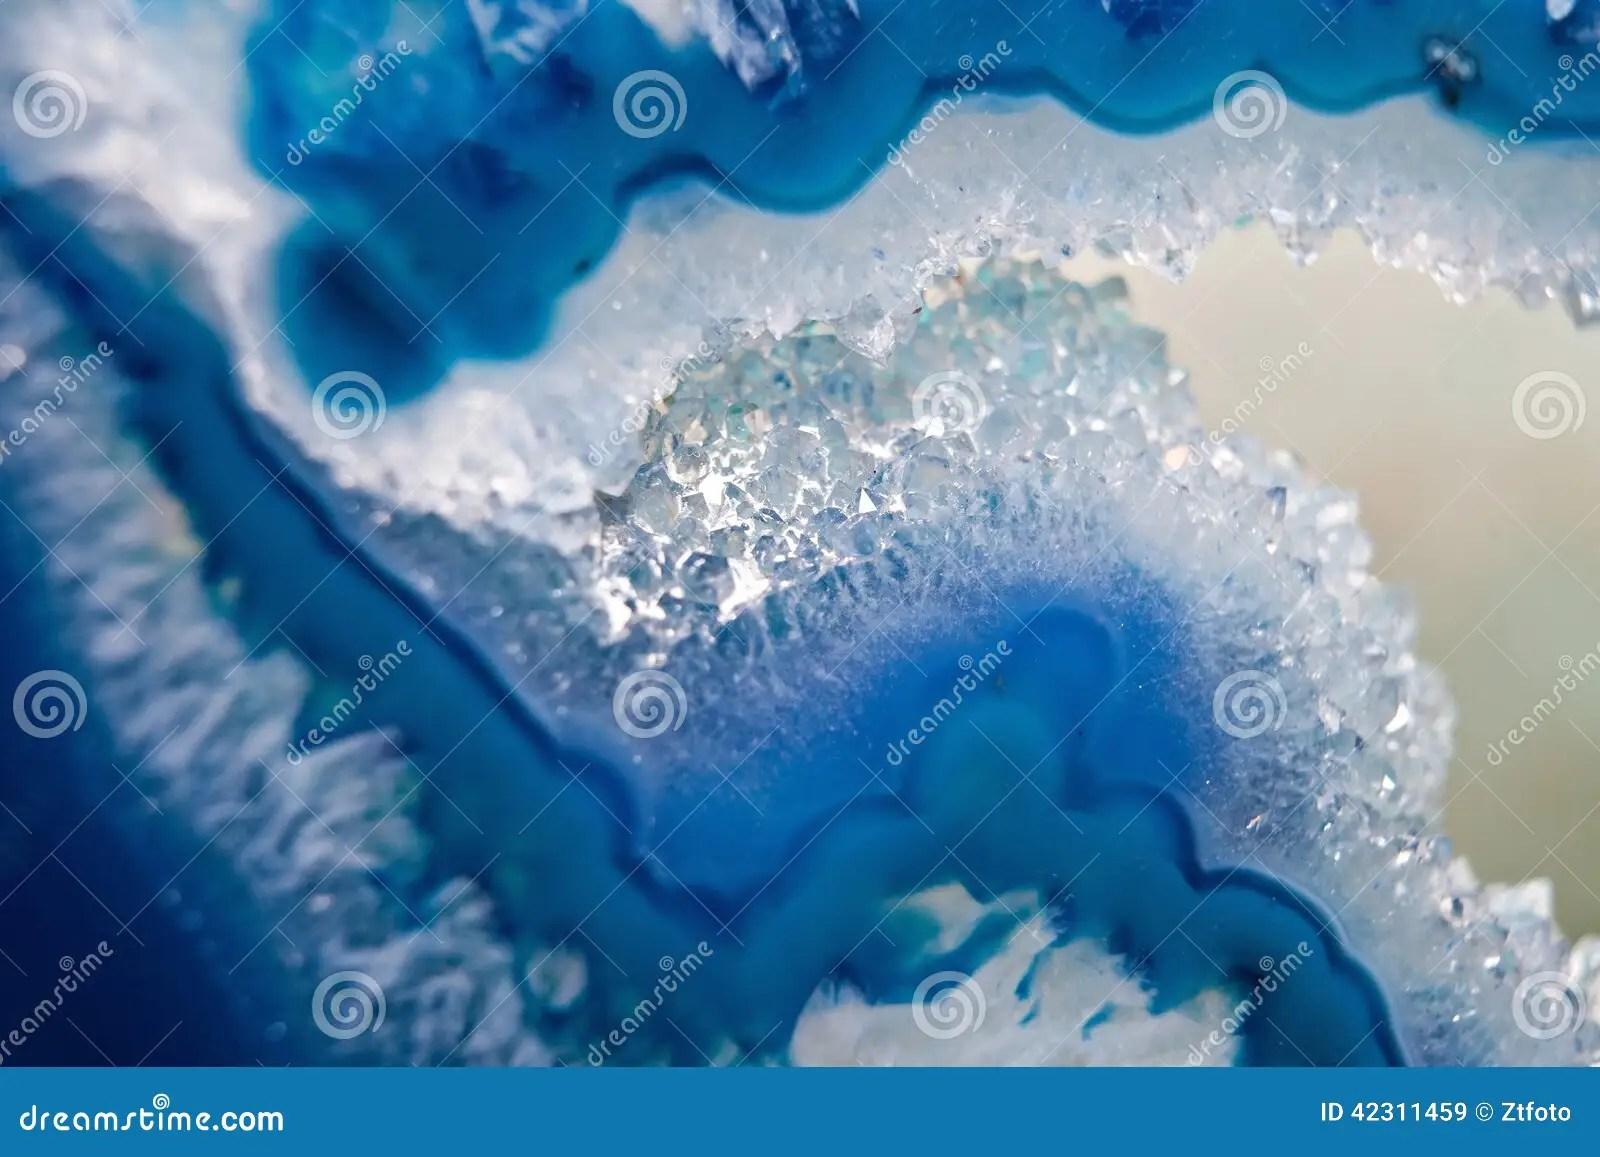 Blue Stone Lapis Lazuli Macro Stock Photo Image 42311459